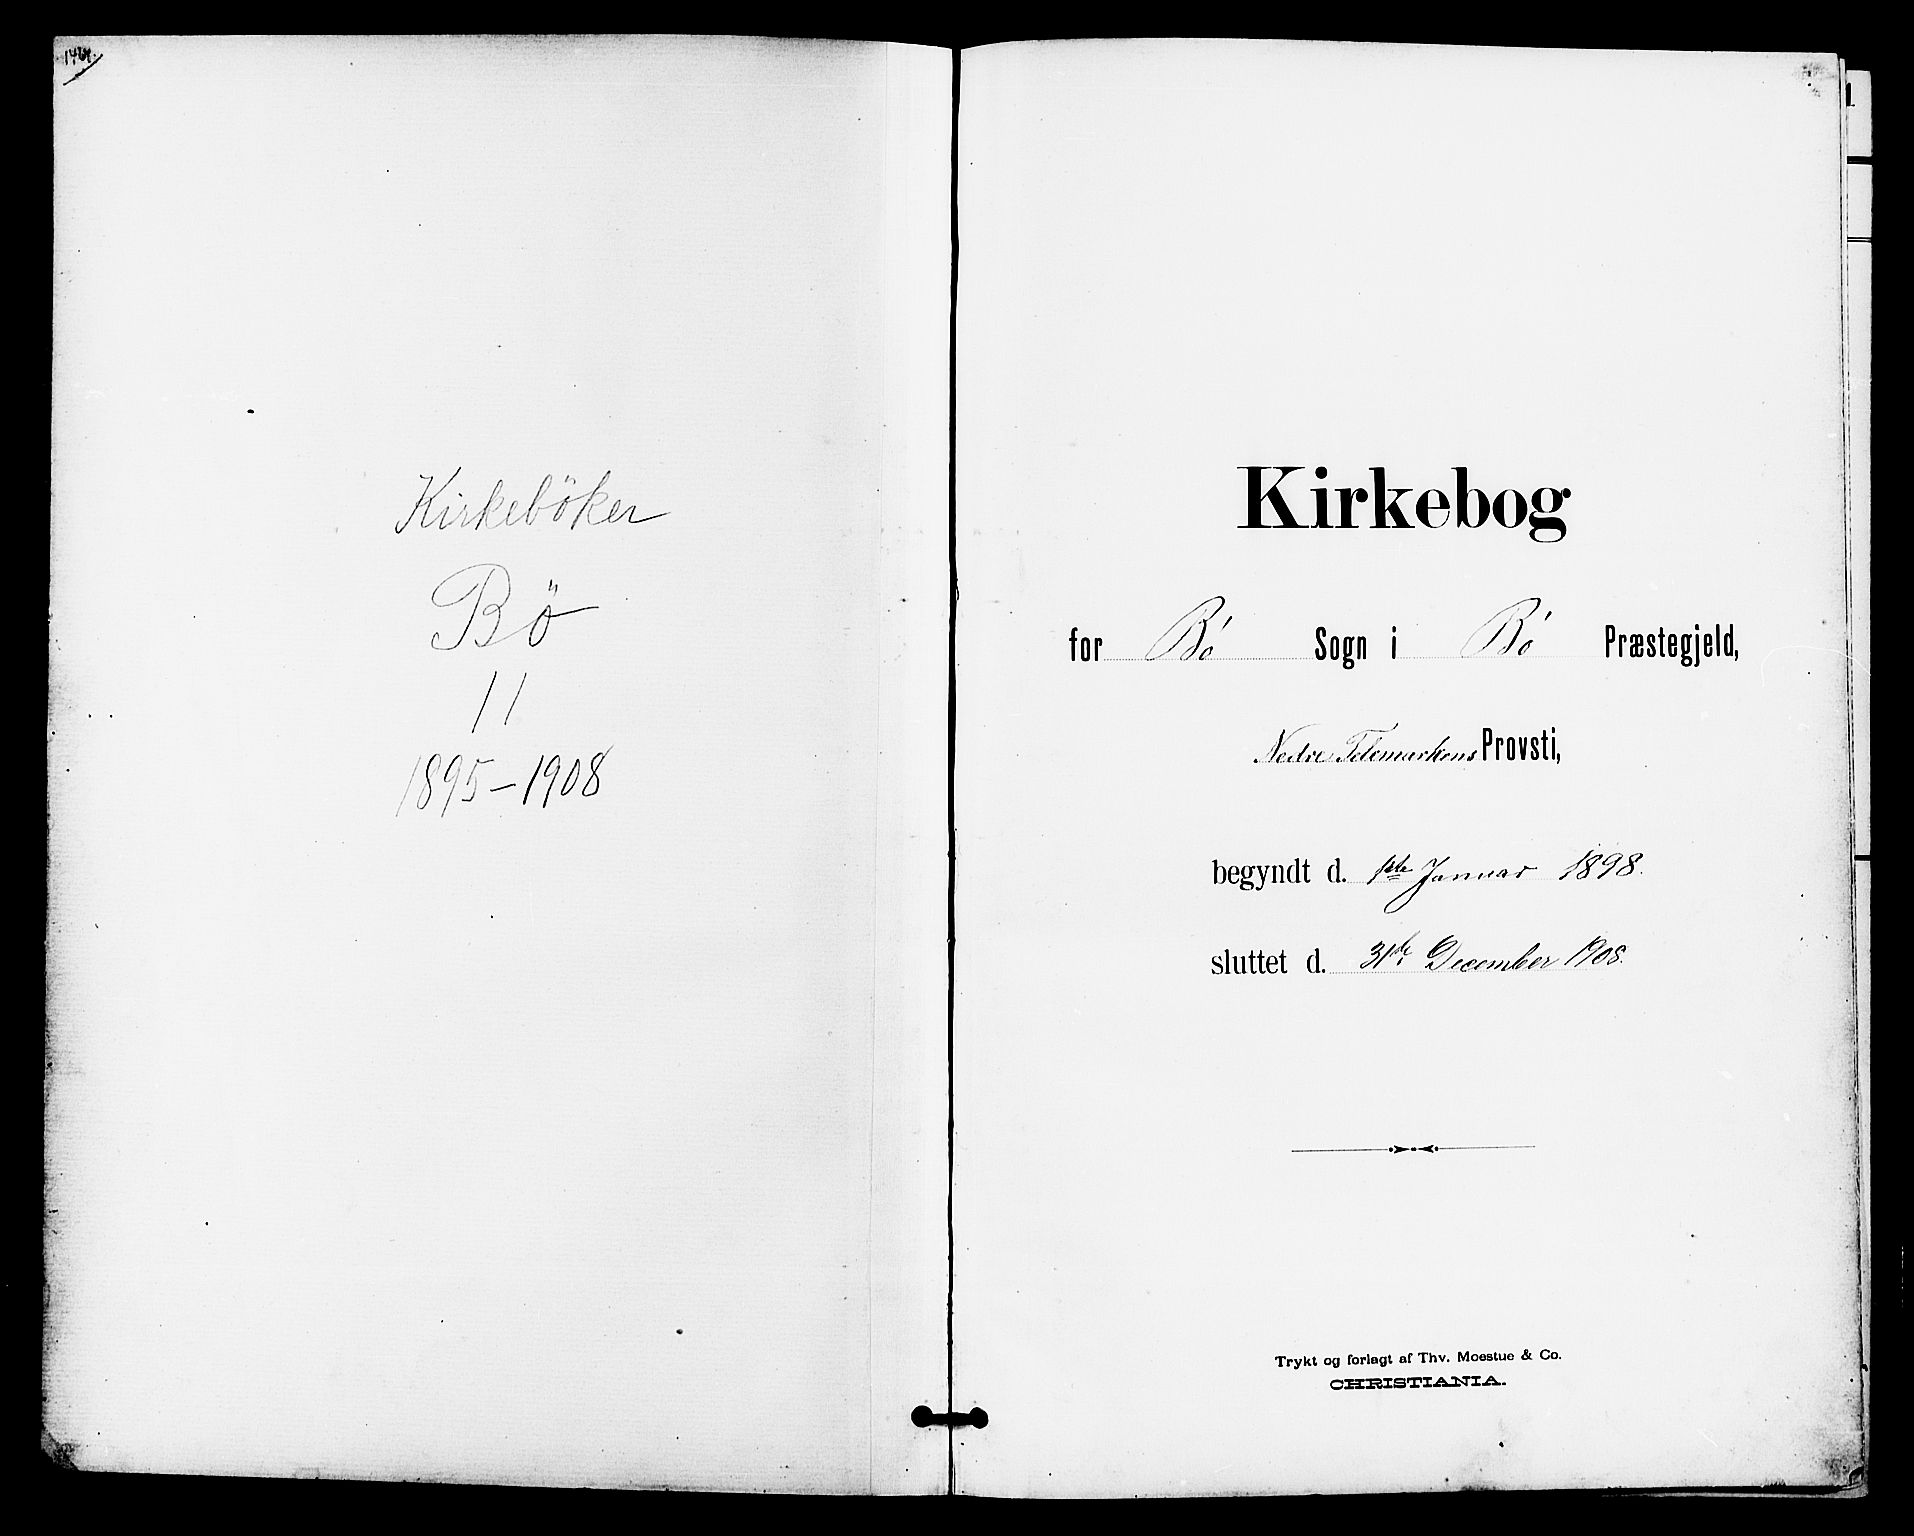 SAKO, Bø kirkebøker, G/Ga/L0006: Klokkerbok nr. 6, 1898-1909